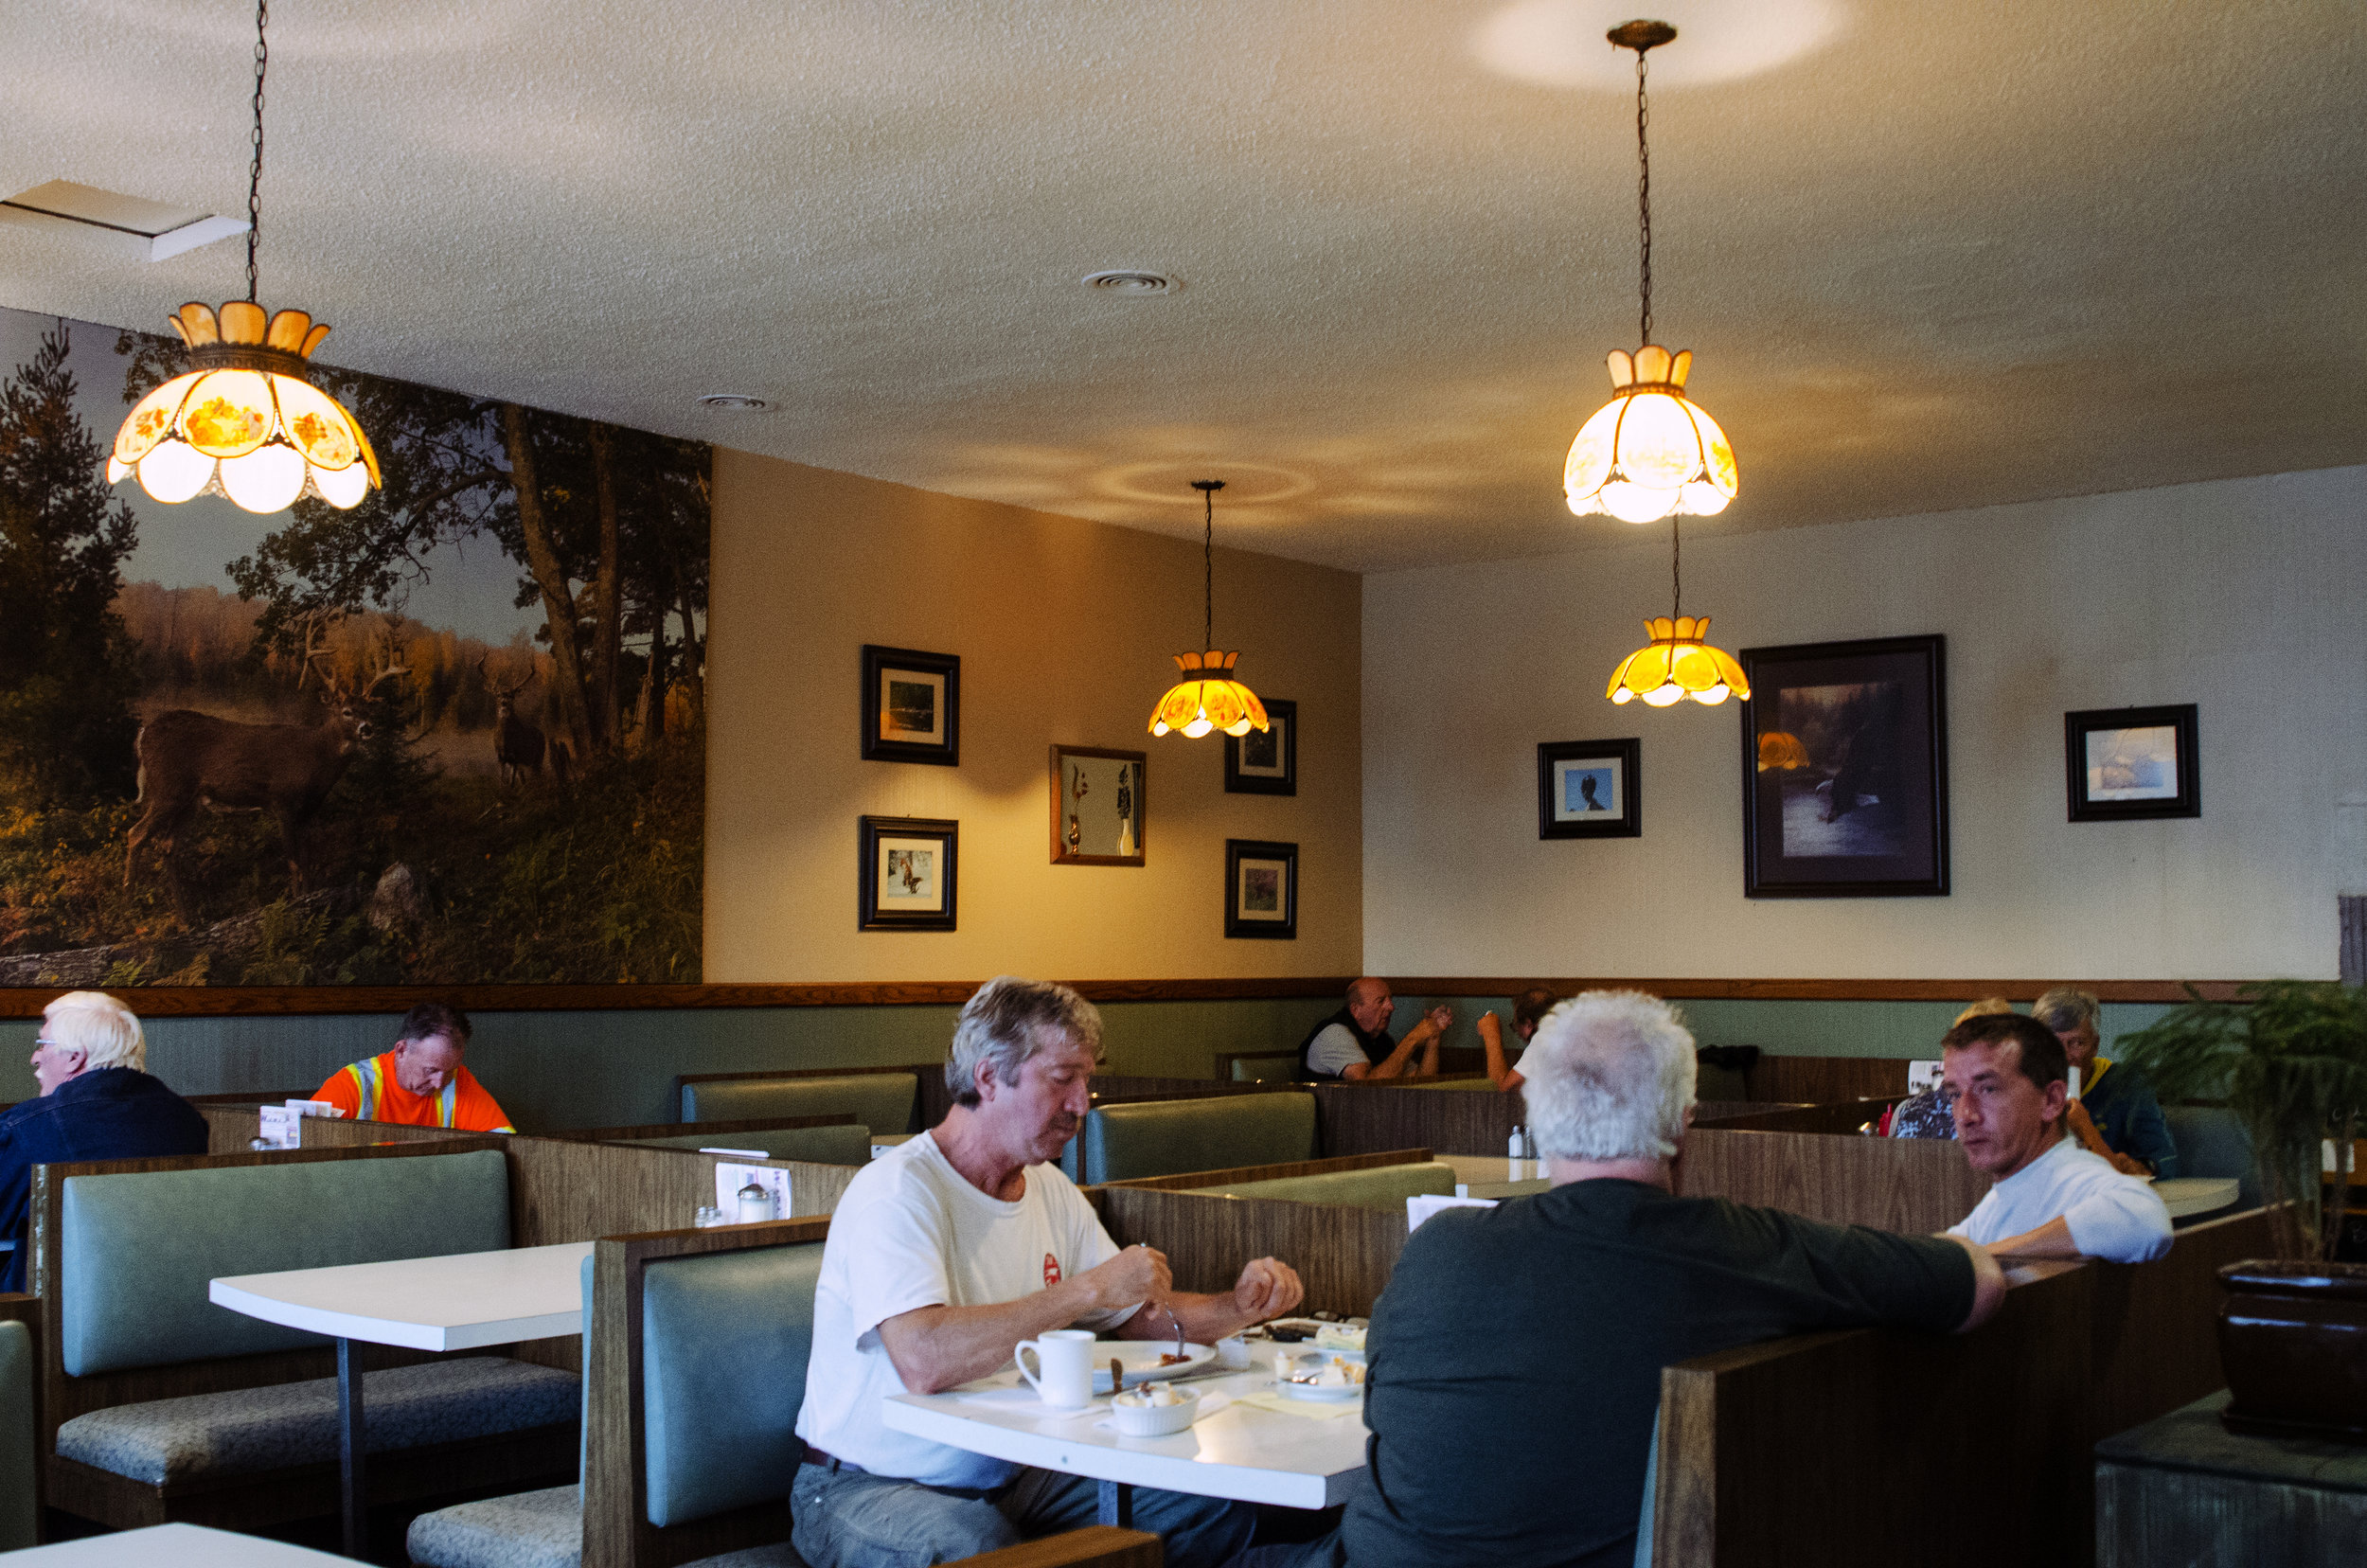 Jenkins, Cheyenne. Embassy Restaurant Breakfast. 2017. Digital Photography. Wawa, Ontario